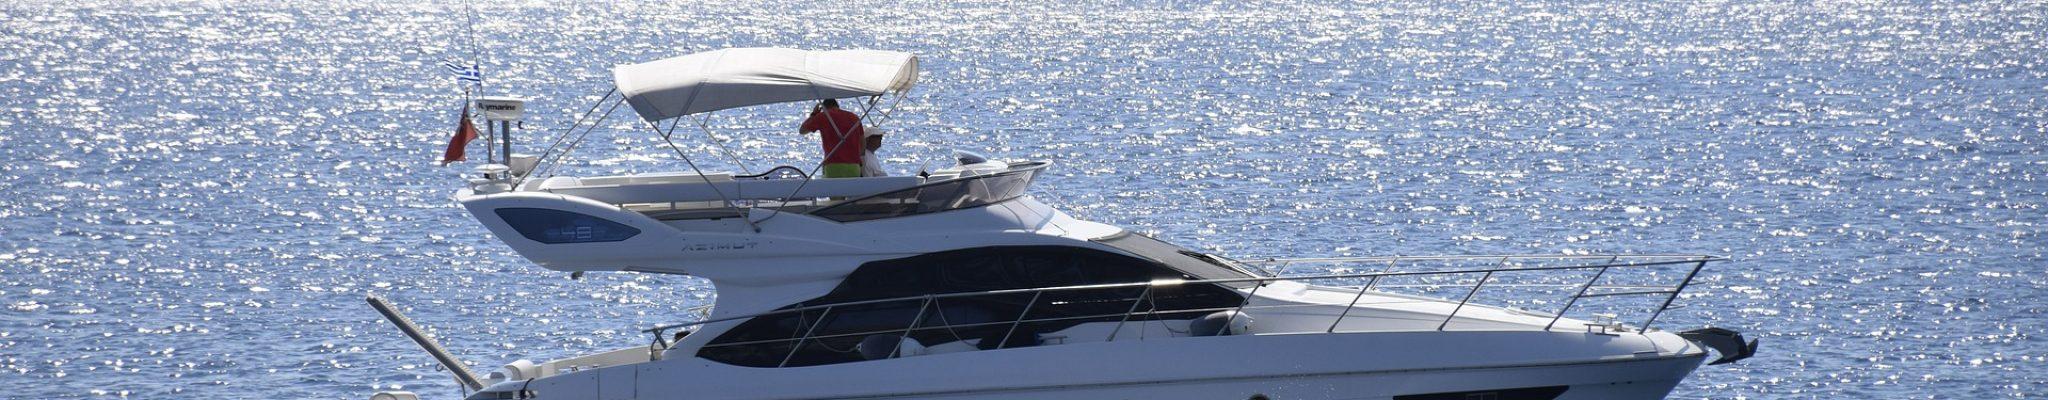 yacht-582738_1920